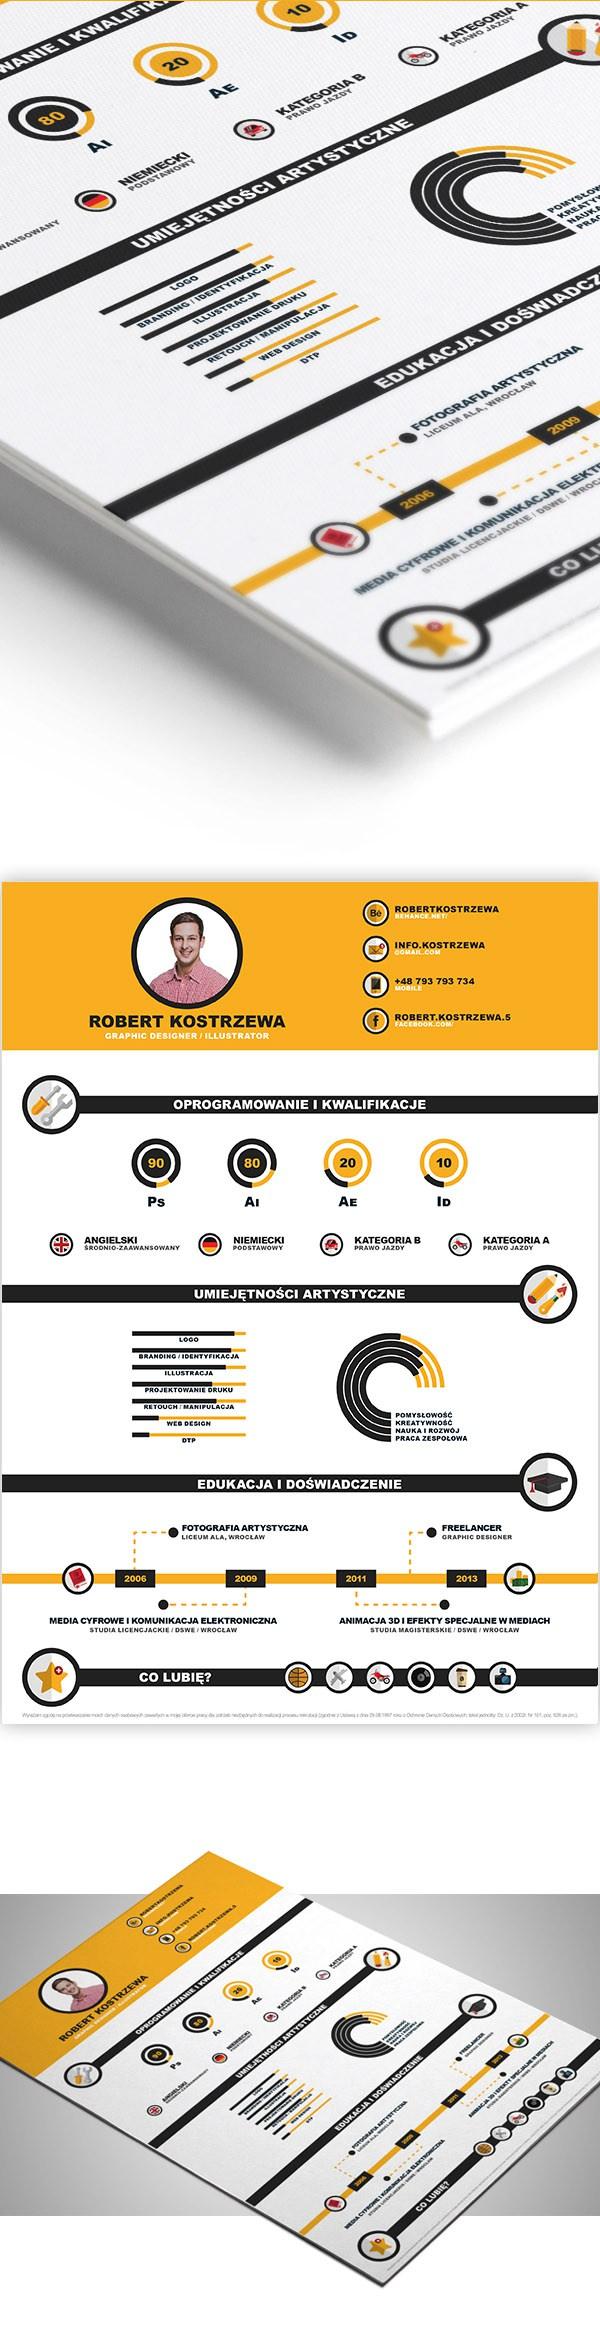 Free Infographic Cv/Resume CV Resume PSD Templates